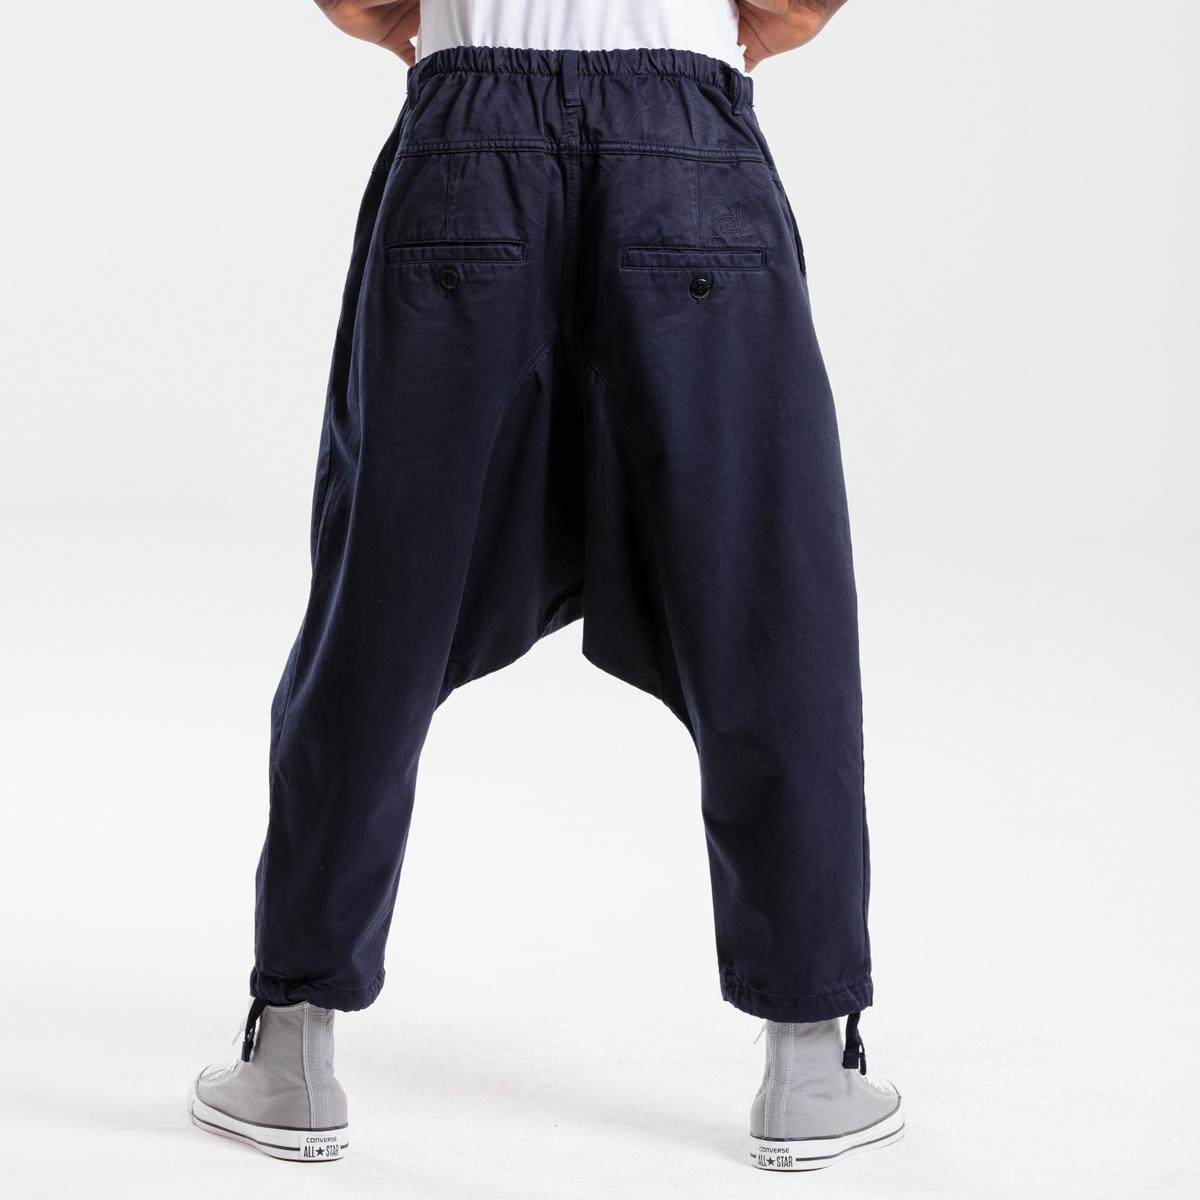 saroual jeans evo marine dcjeans dos